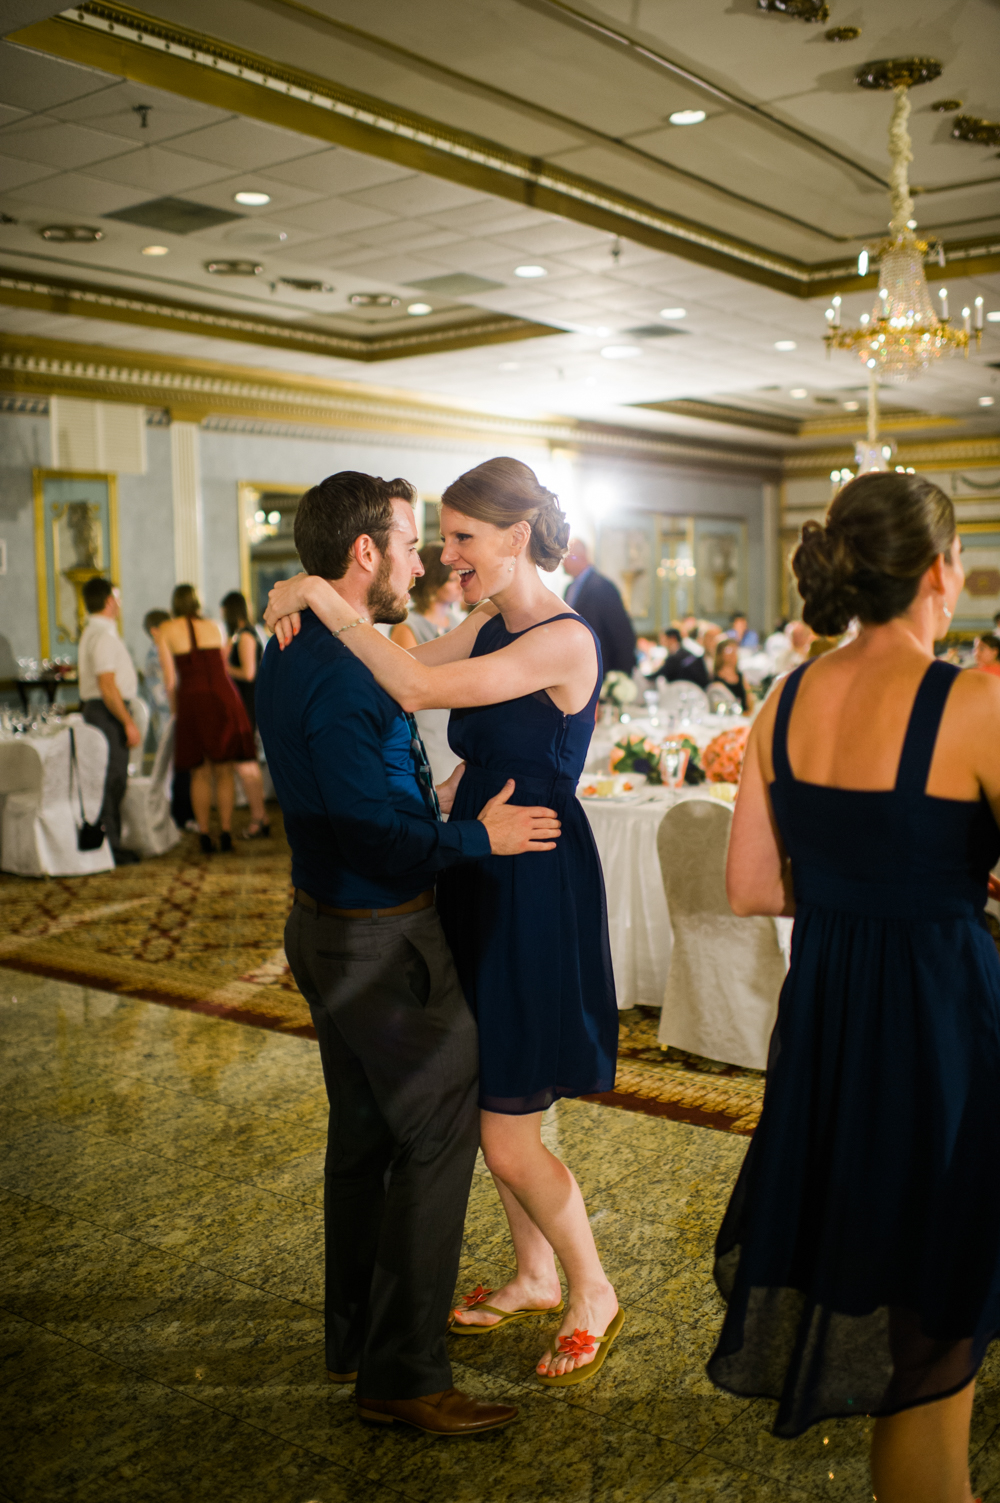 Mendenhall_Inn_Wedding_Pennsylvania_Rebecca_Watkins_Photography_2014-069.jpg